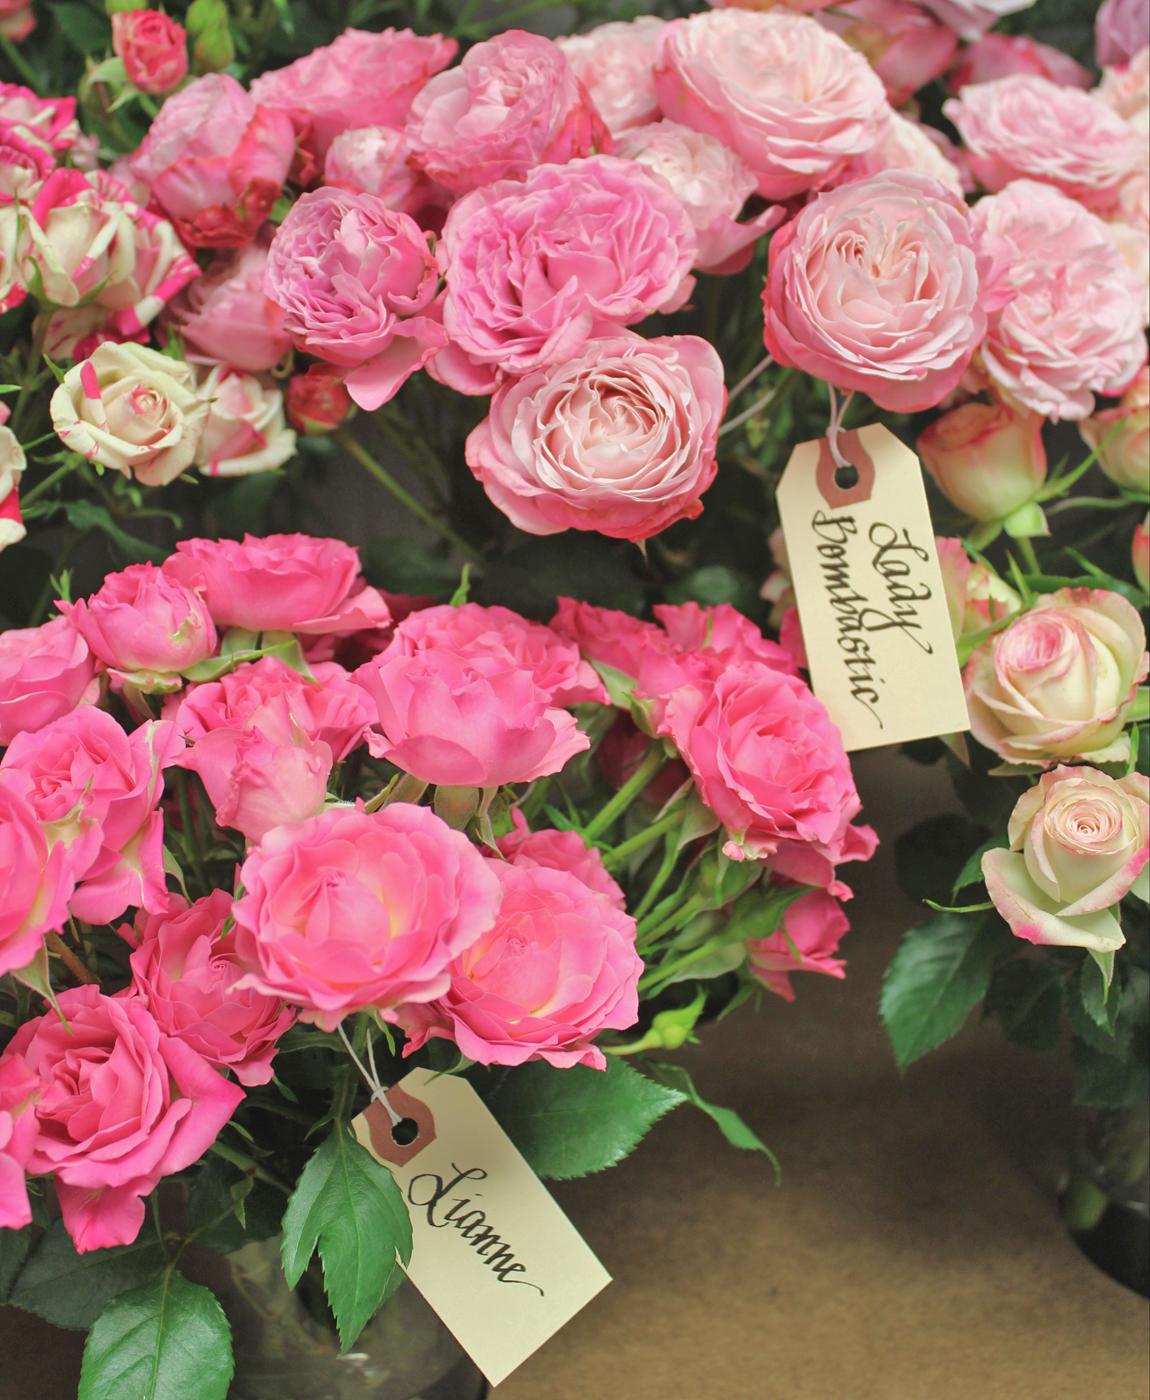 harvest-rose-5